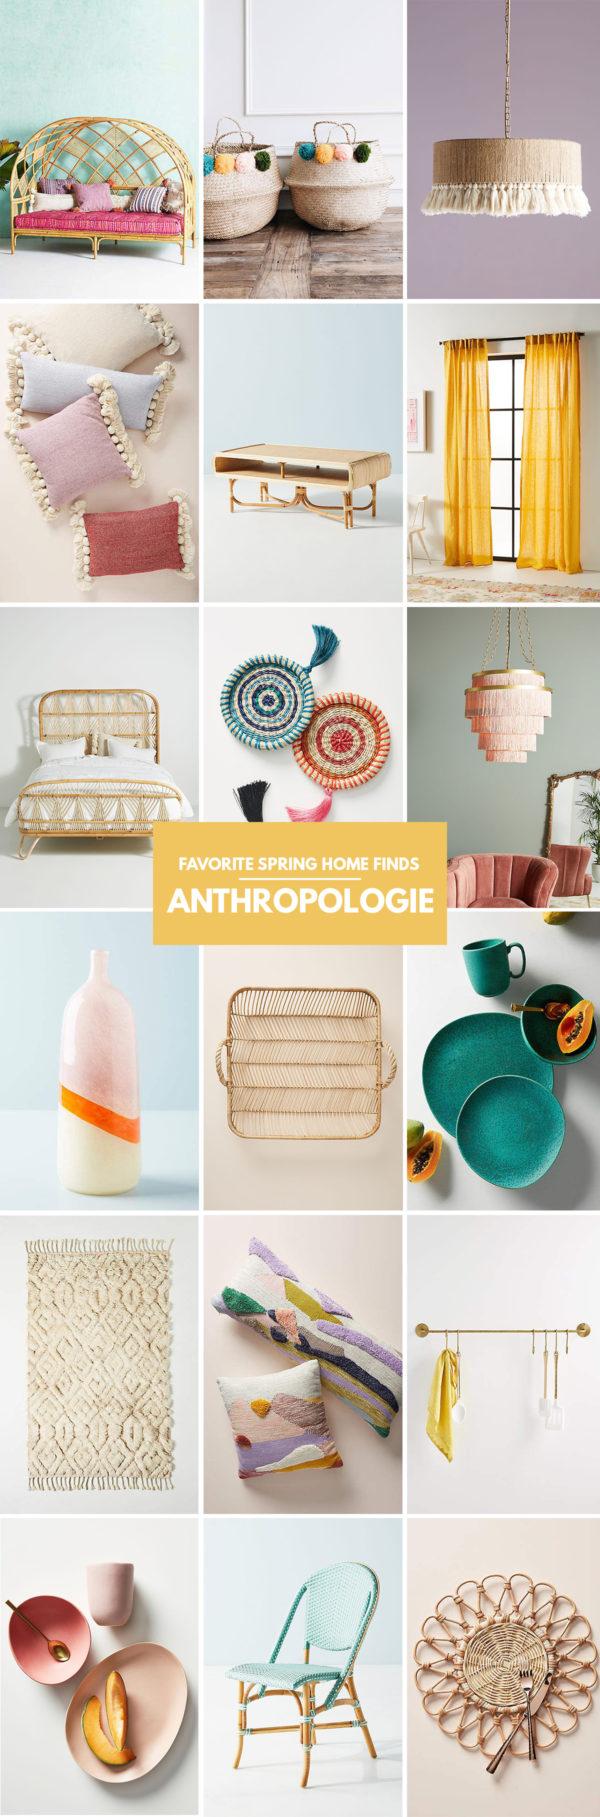 Best Anthropologie Spring 2019 Home Finds